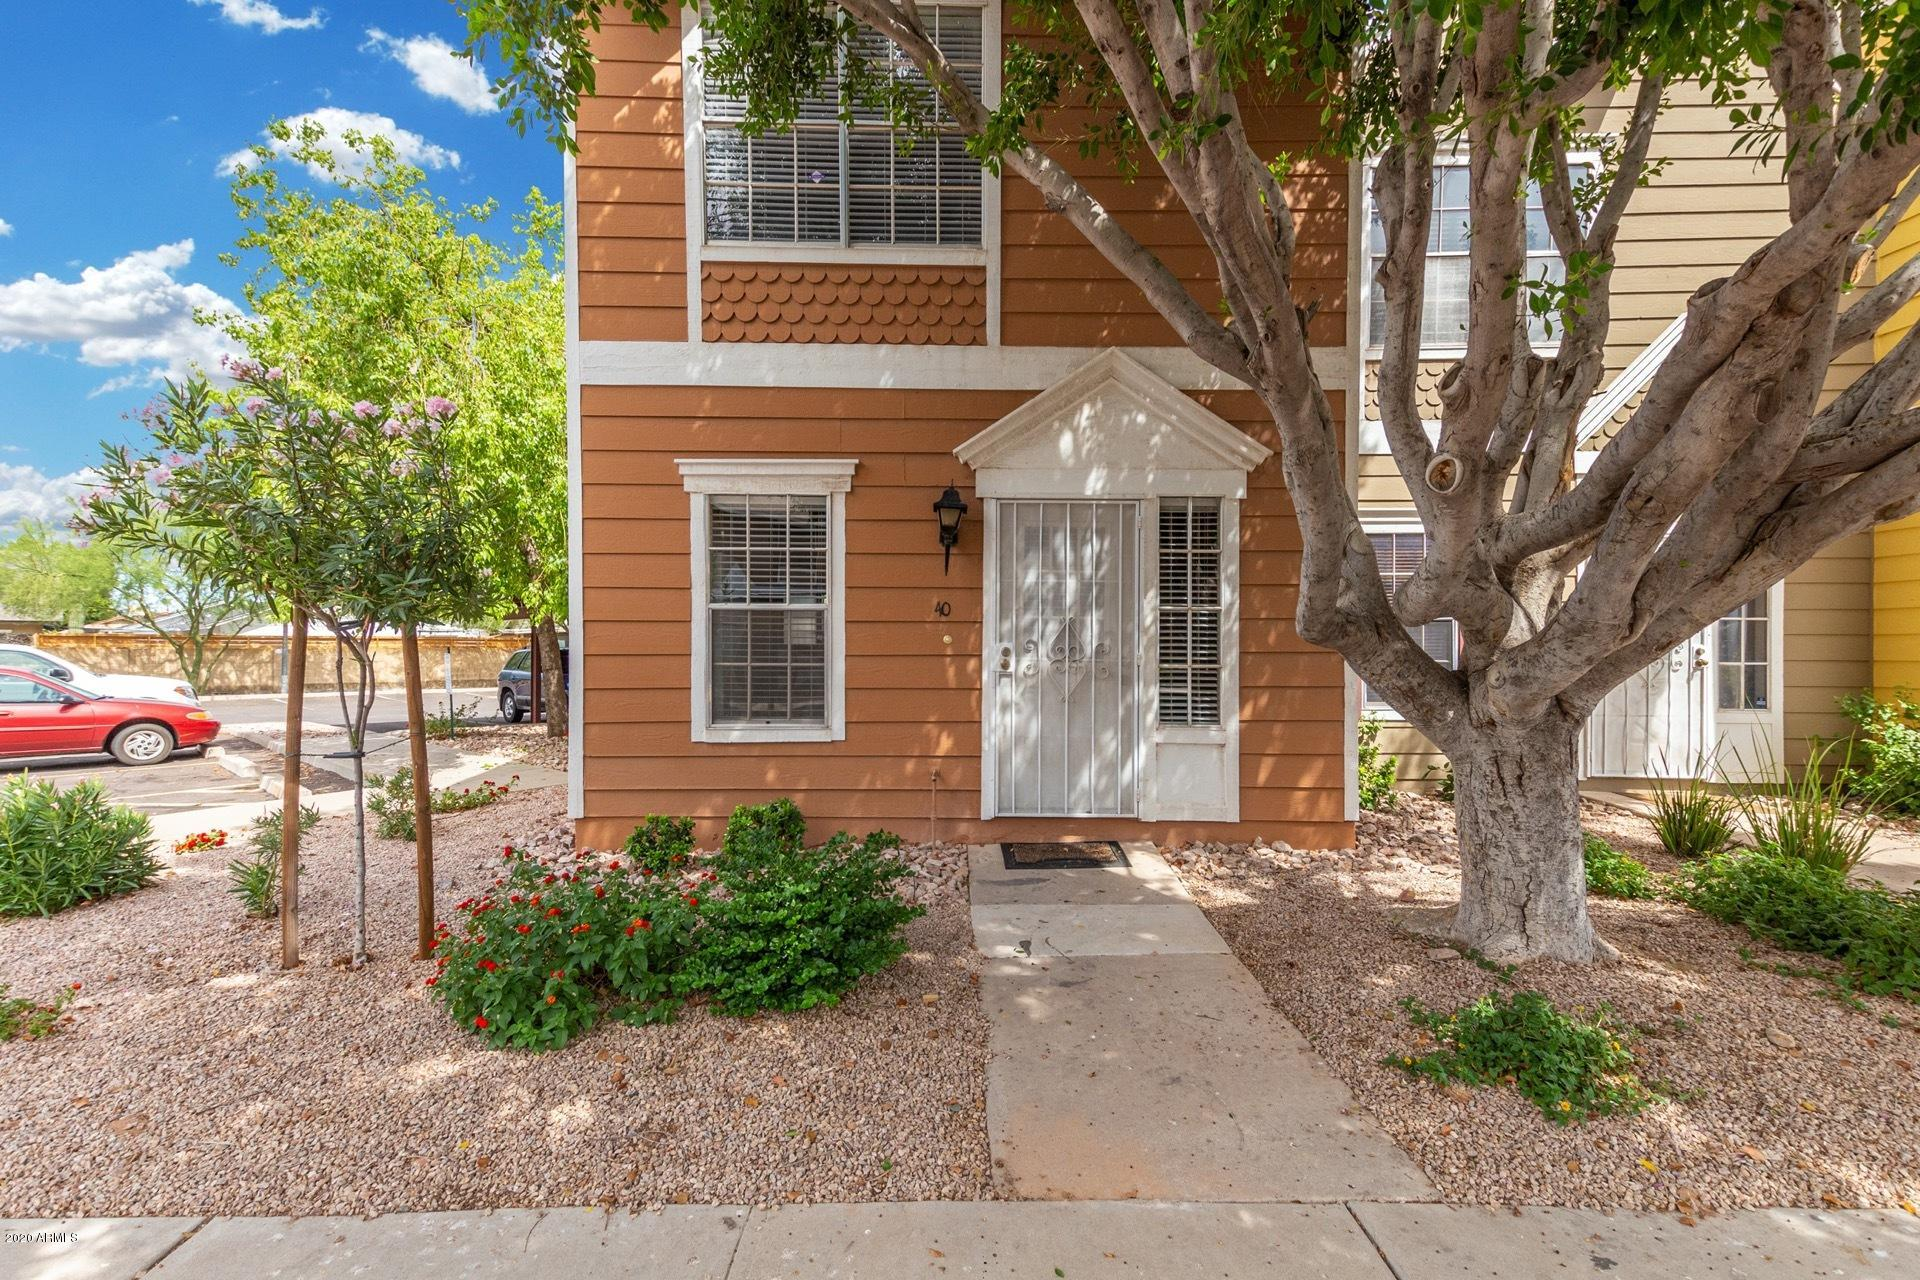 Photo of 1970 N HARTFORD Street #40, Chandler, AZ 85225